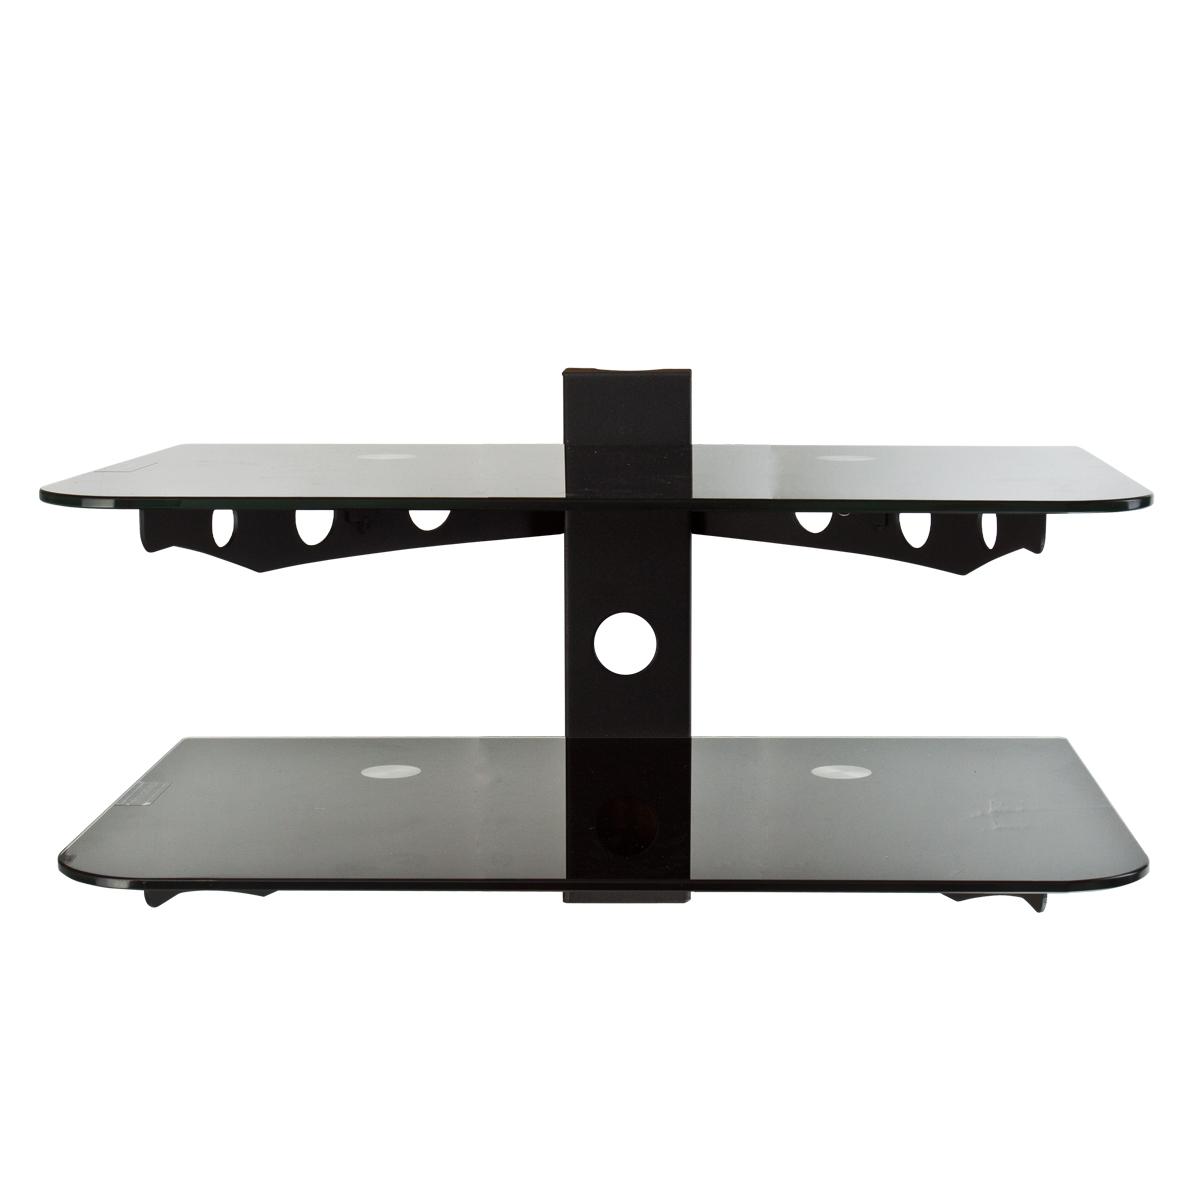 flat tv wall mount bracket 30 60 component shelf 2 tier av dvd stand ebay. Black Bedroom Furniture Sets. Home Design Ideas